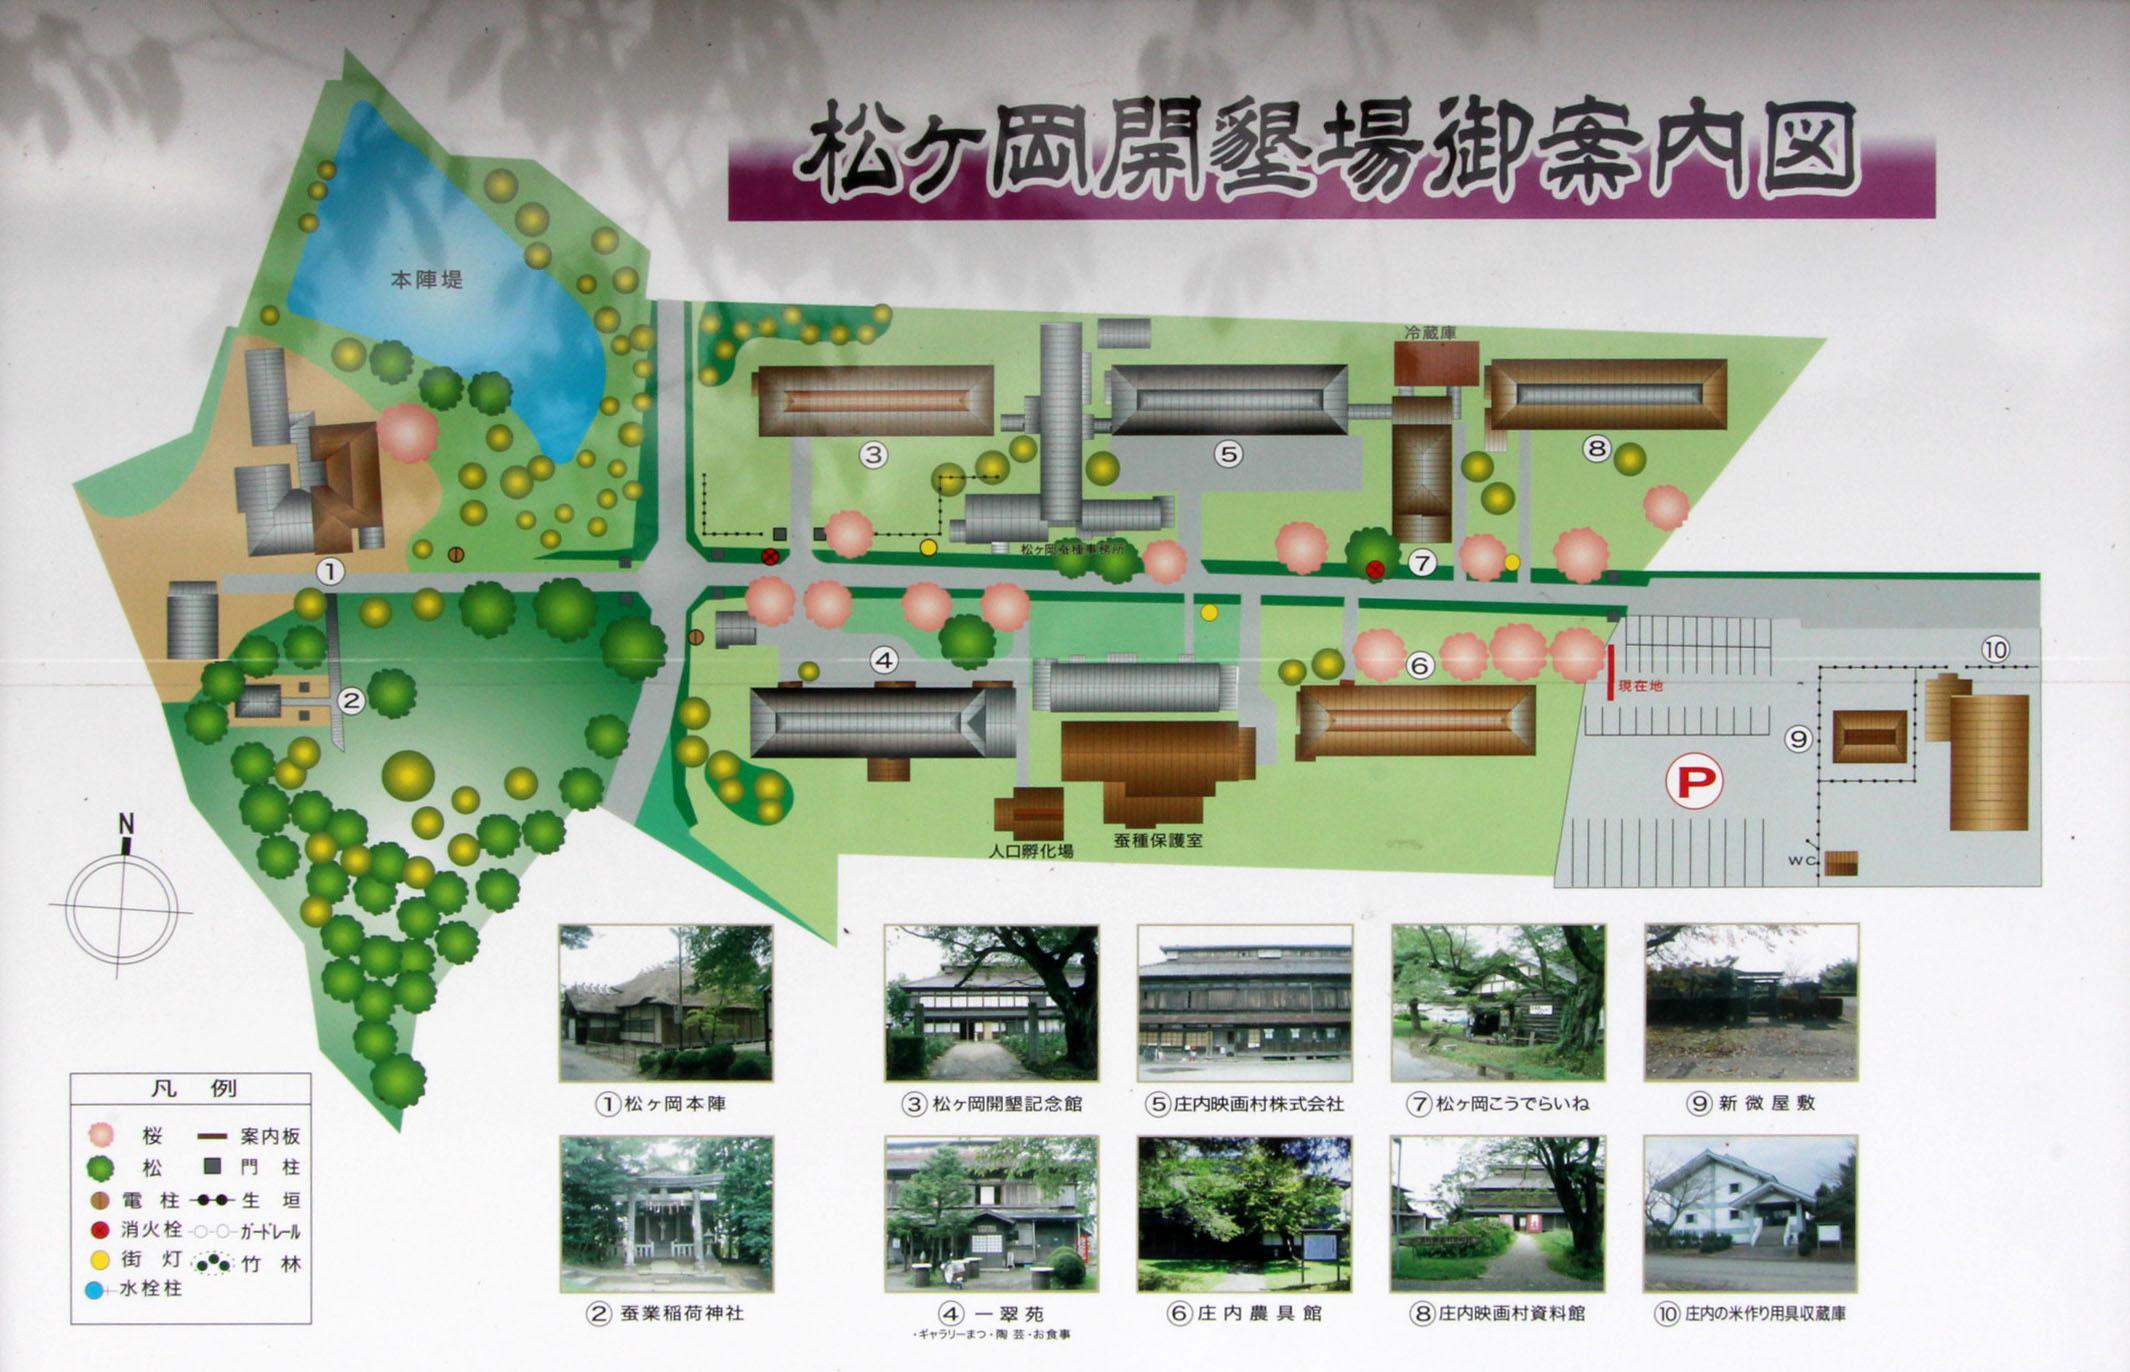 庄内の旅:松ヶ丘開墾記念館_e0054299_12112857.jpg